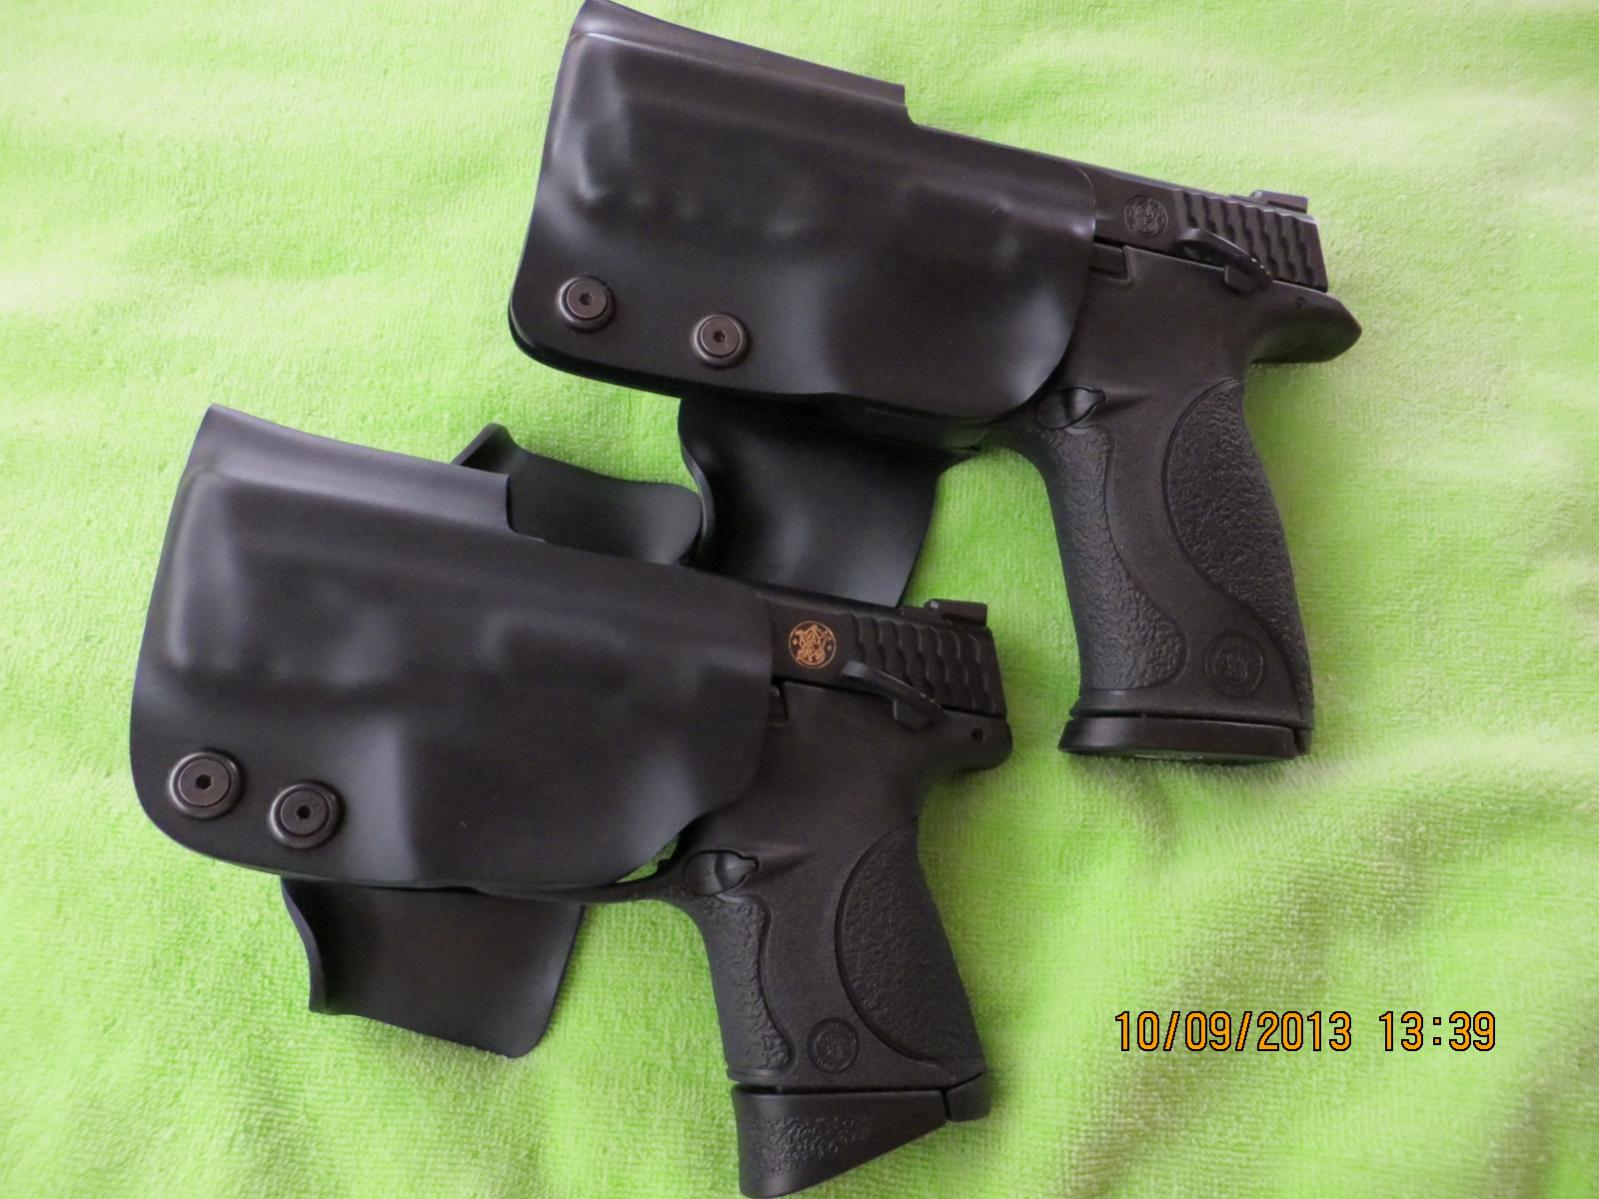 Comfortable OWB SR9c holster - cheap-img_0002-002.jpg